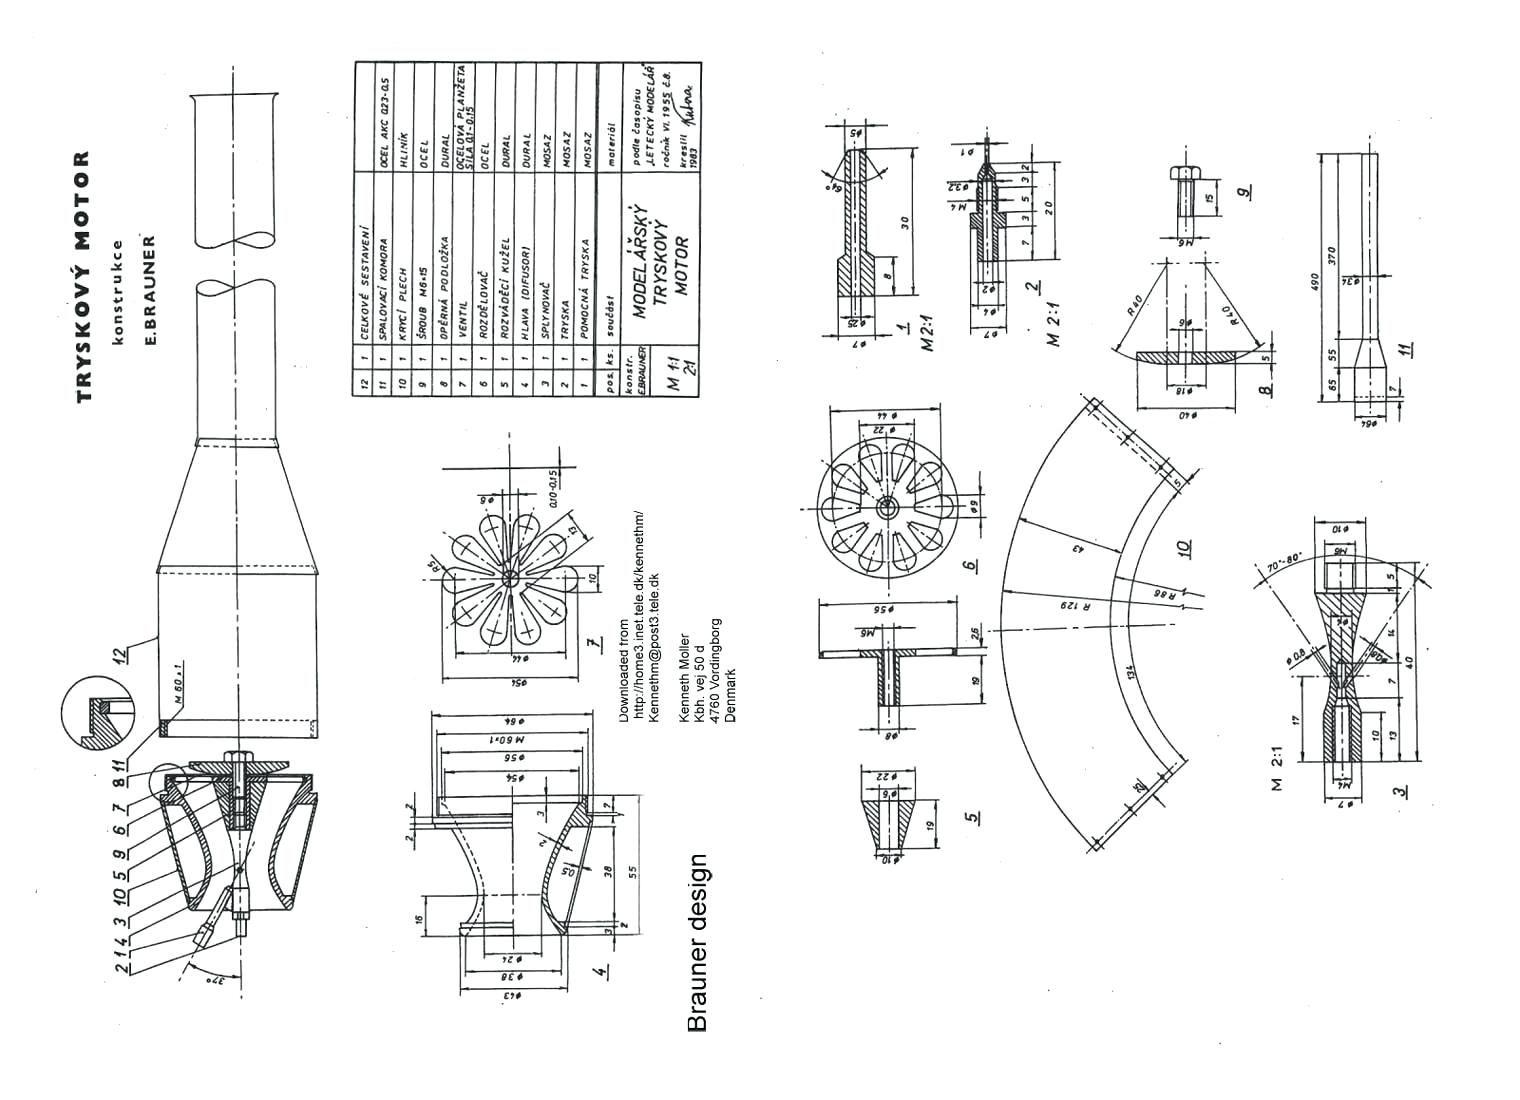 hight resolution of diagram jet engine parts diagram